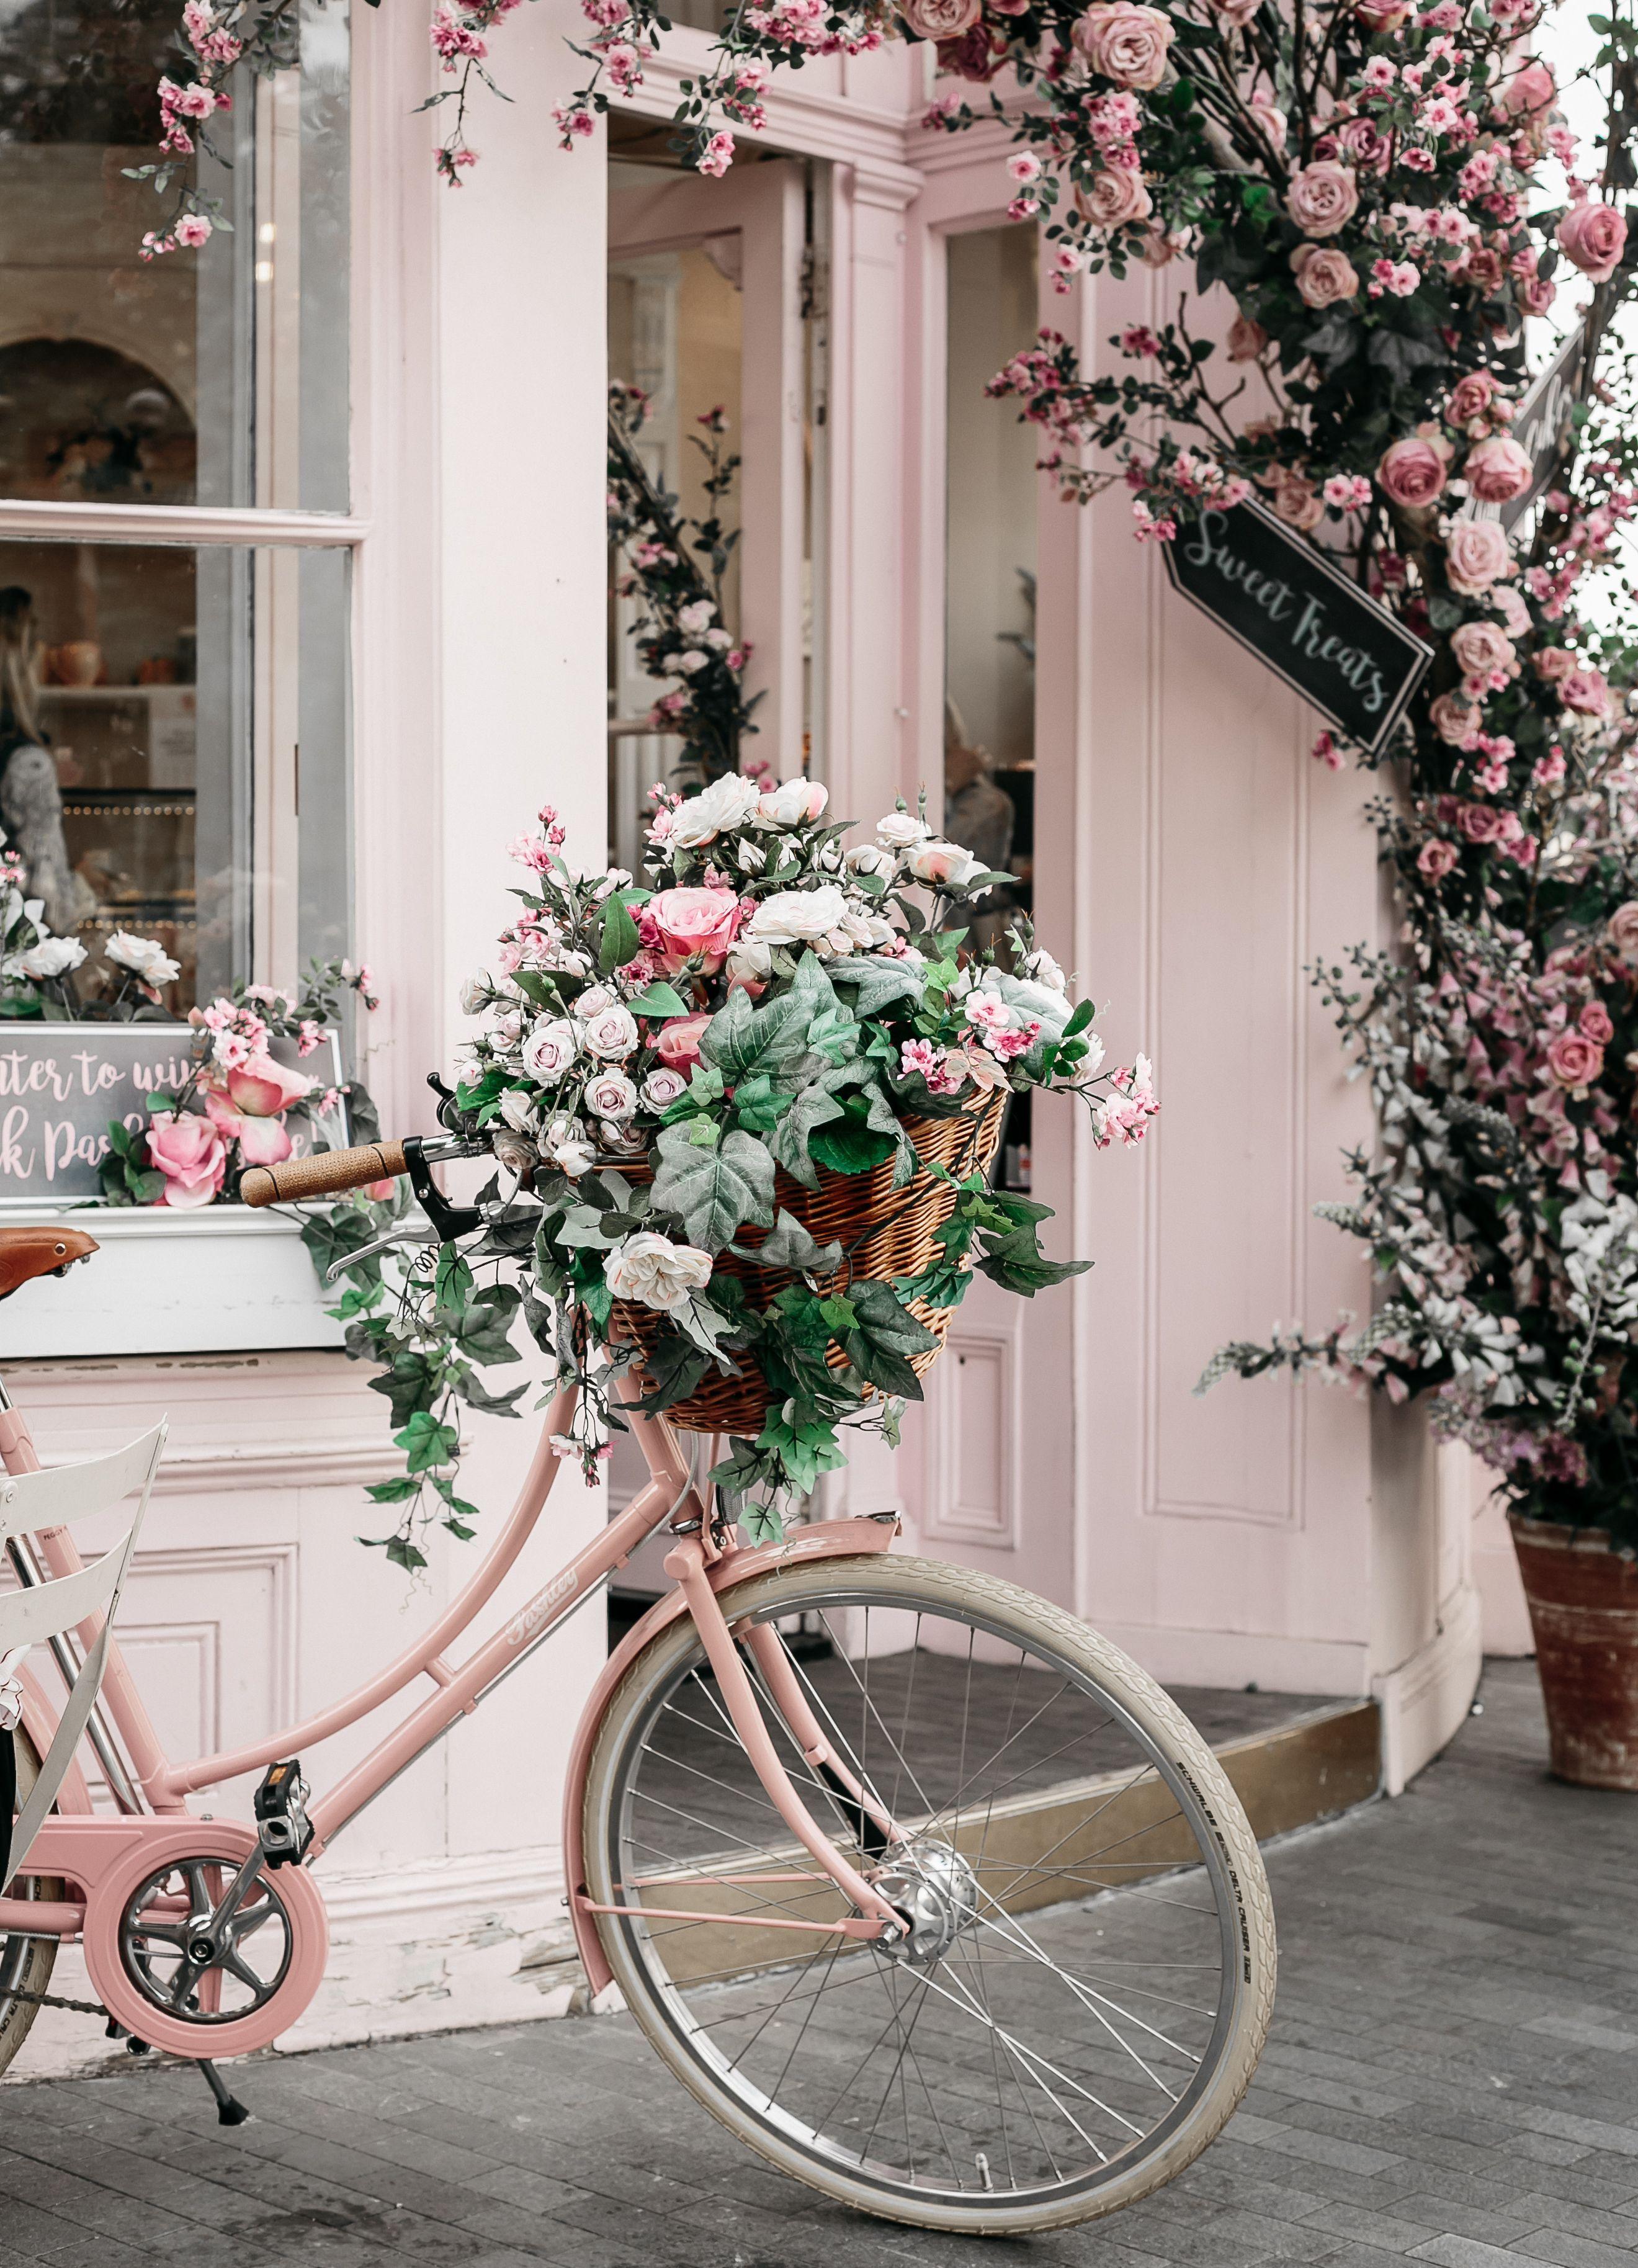 Peggy Porschen Cakes Elizabeth Street Belgravia London In 2020 Flower Aesthetic Pastel Pink Aesthetic Photo Wall Collage